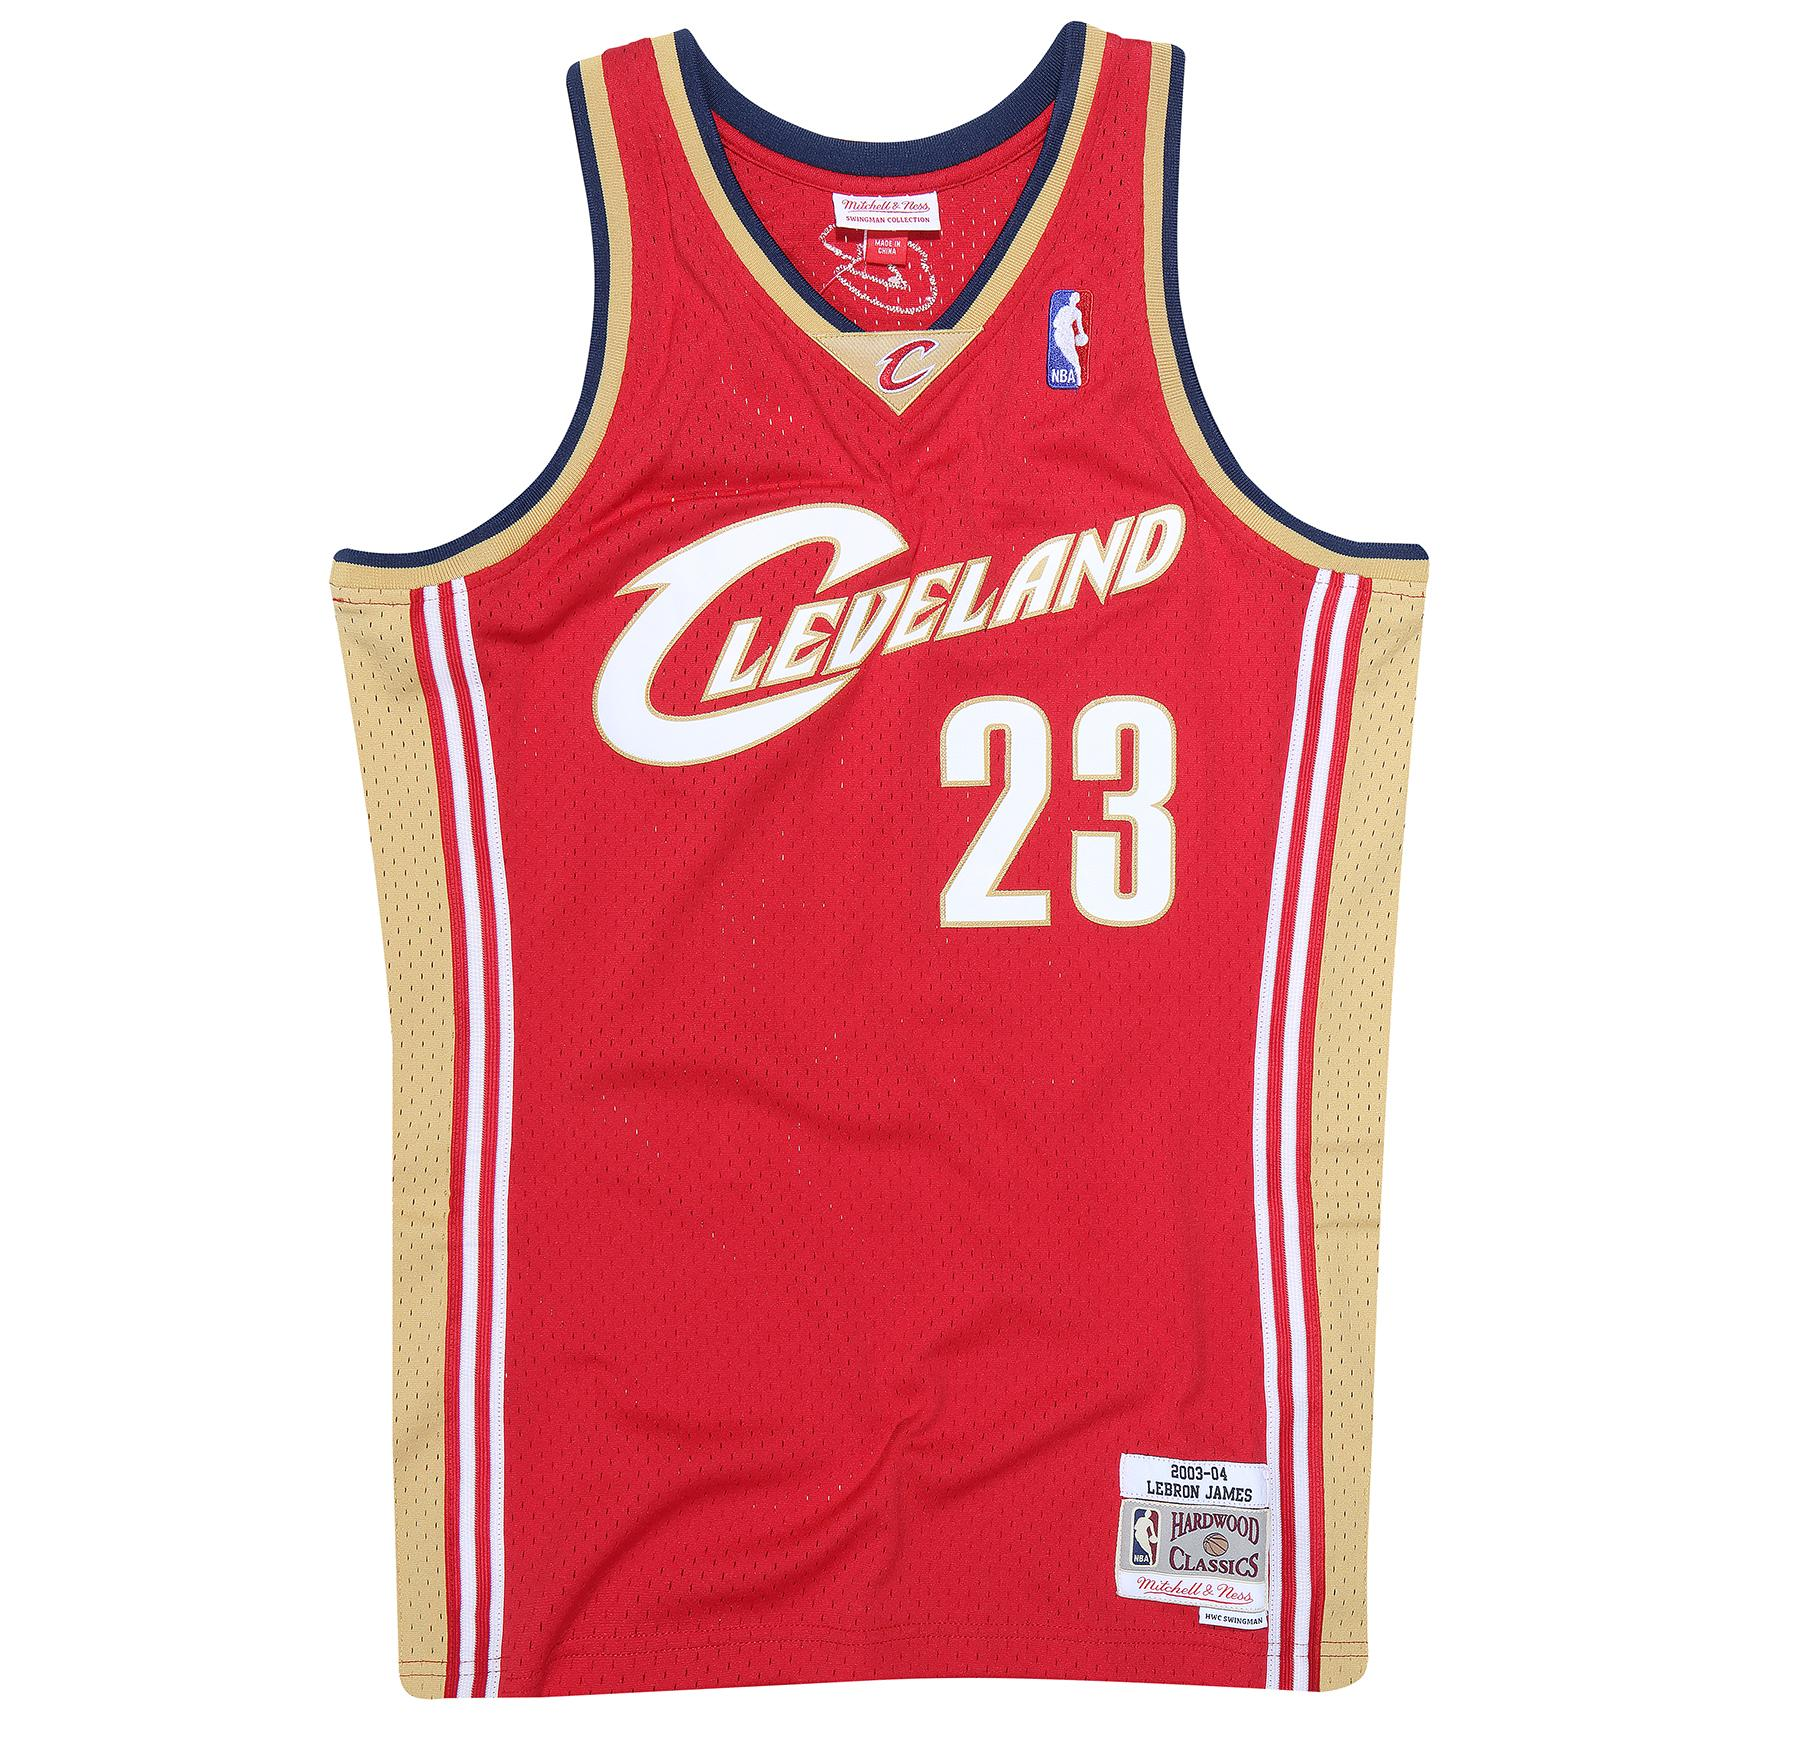 LeBron James 2003-04 Swingman Jersey Cleveland Cavaliers 4c1d0dd56